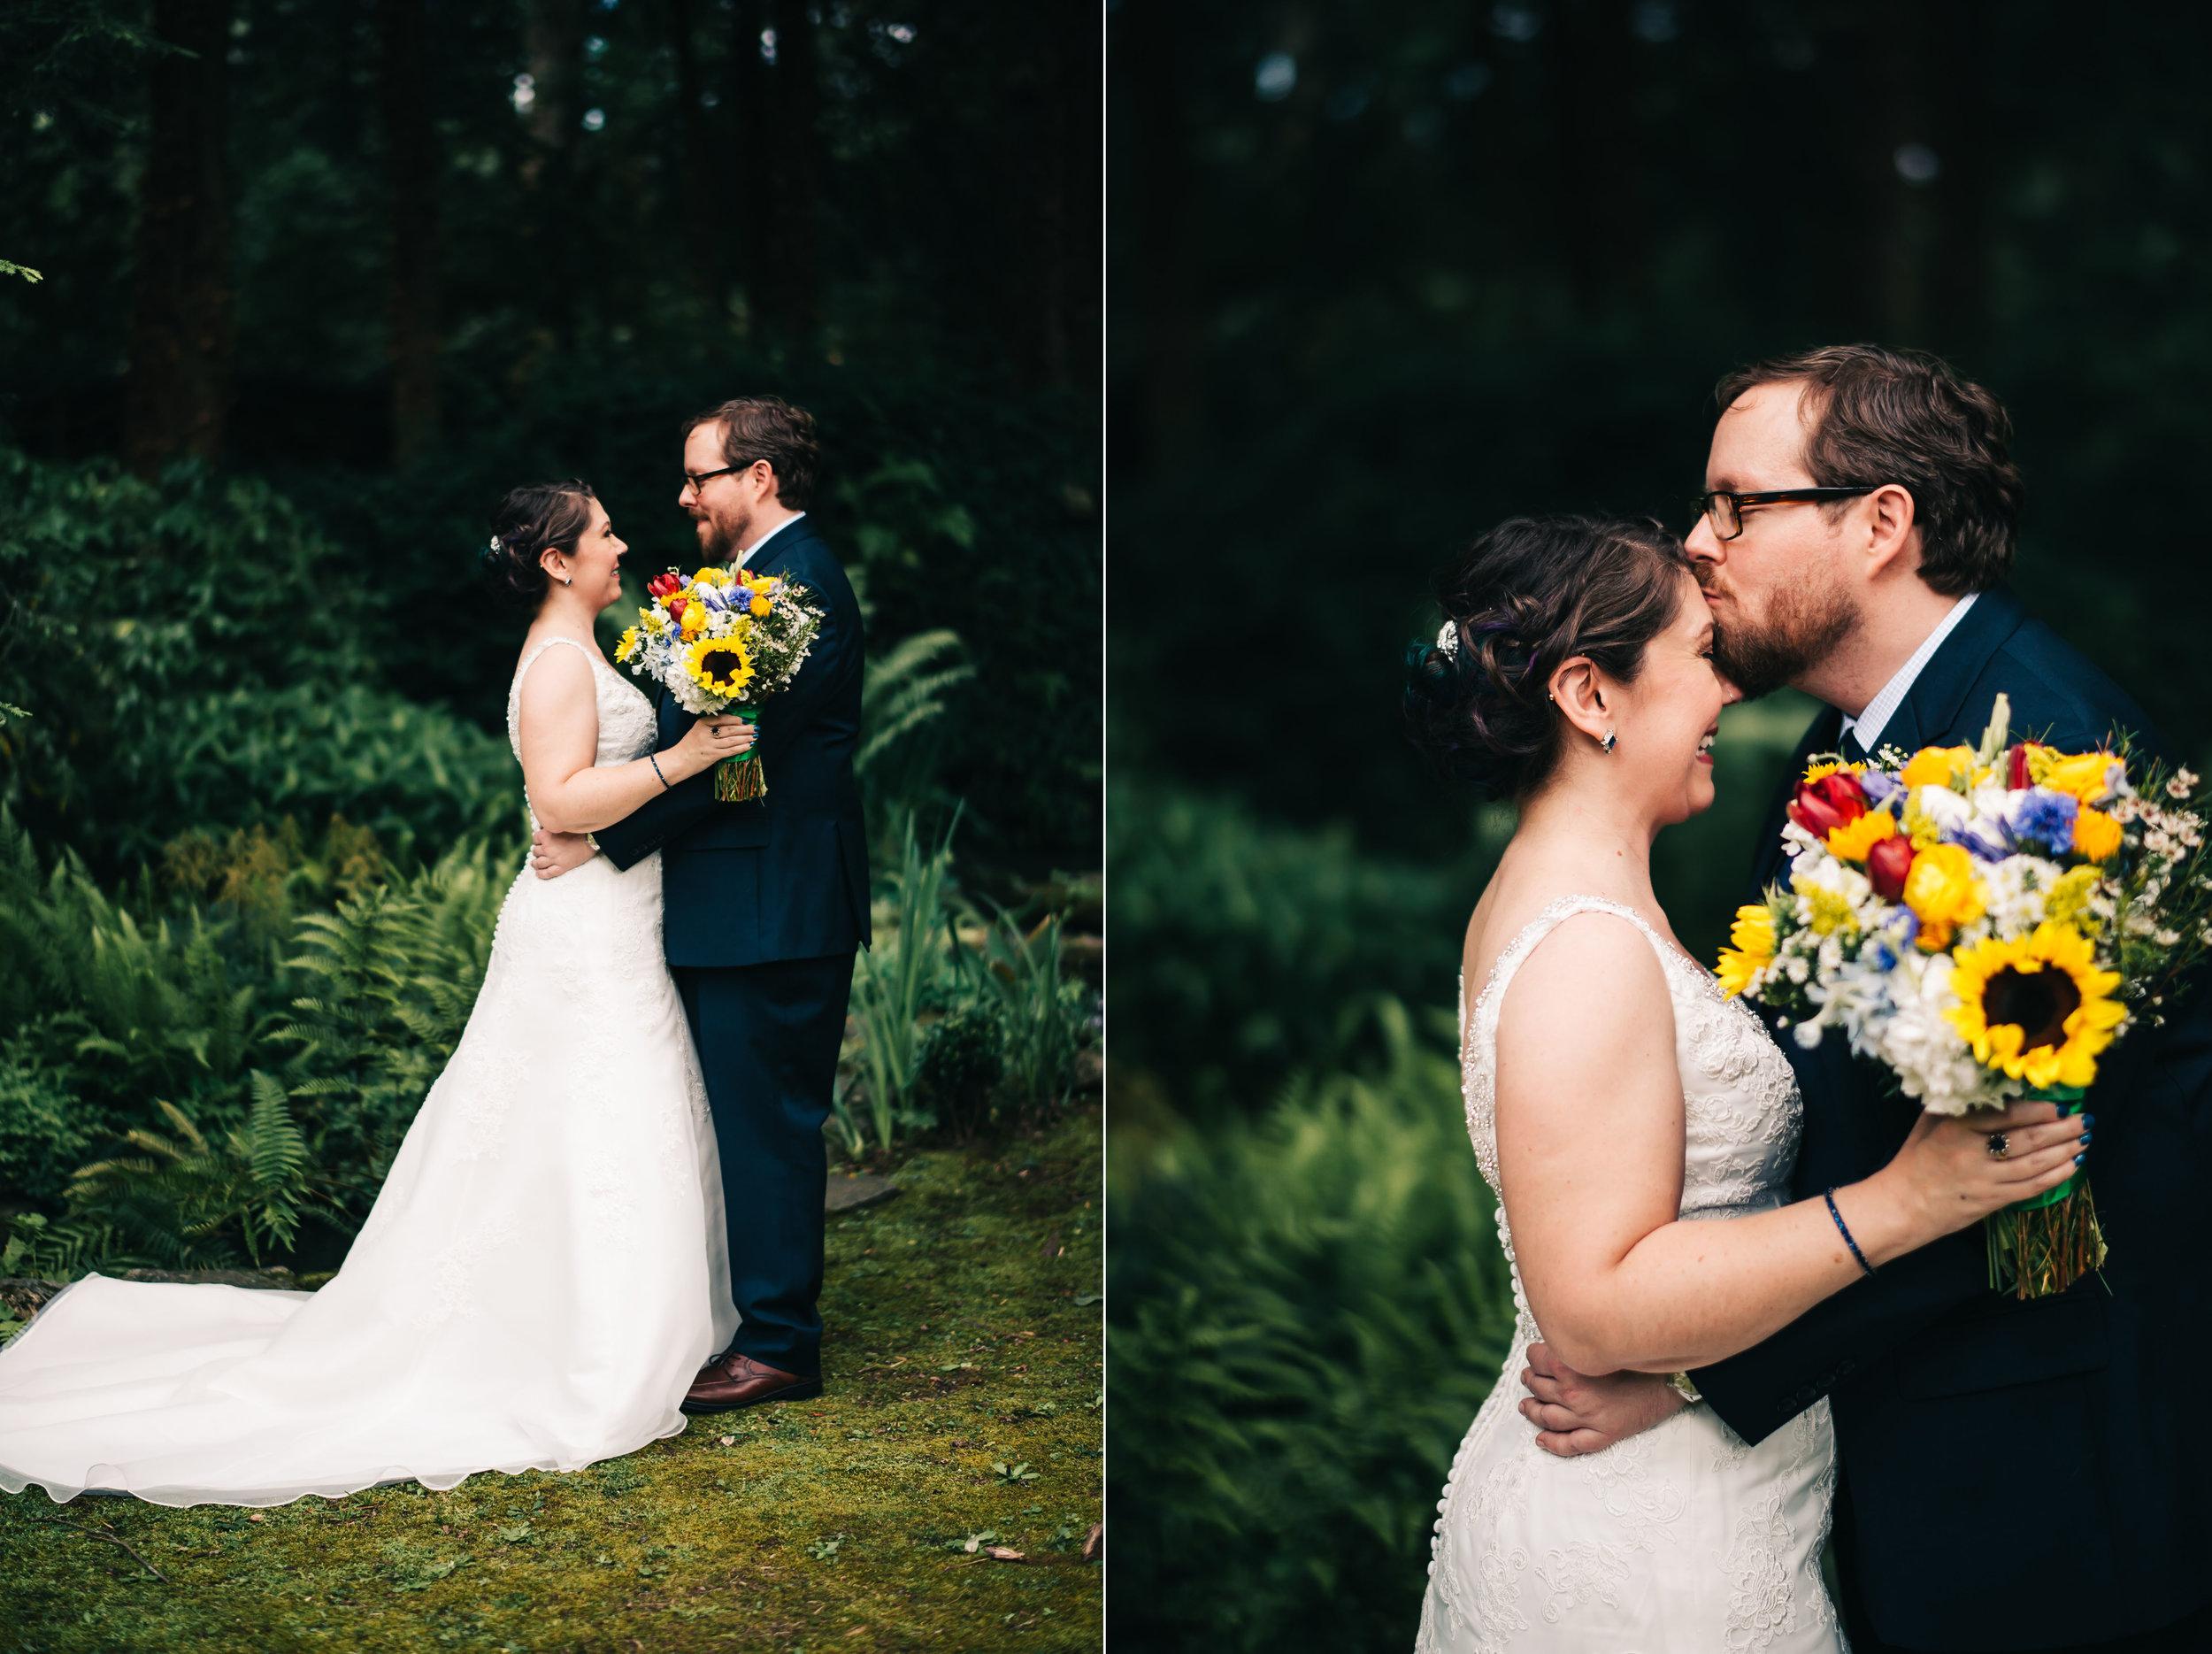 atlanta wedding photographer dunaway gardens 4.jpg